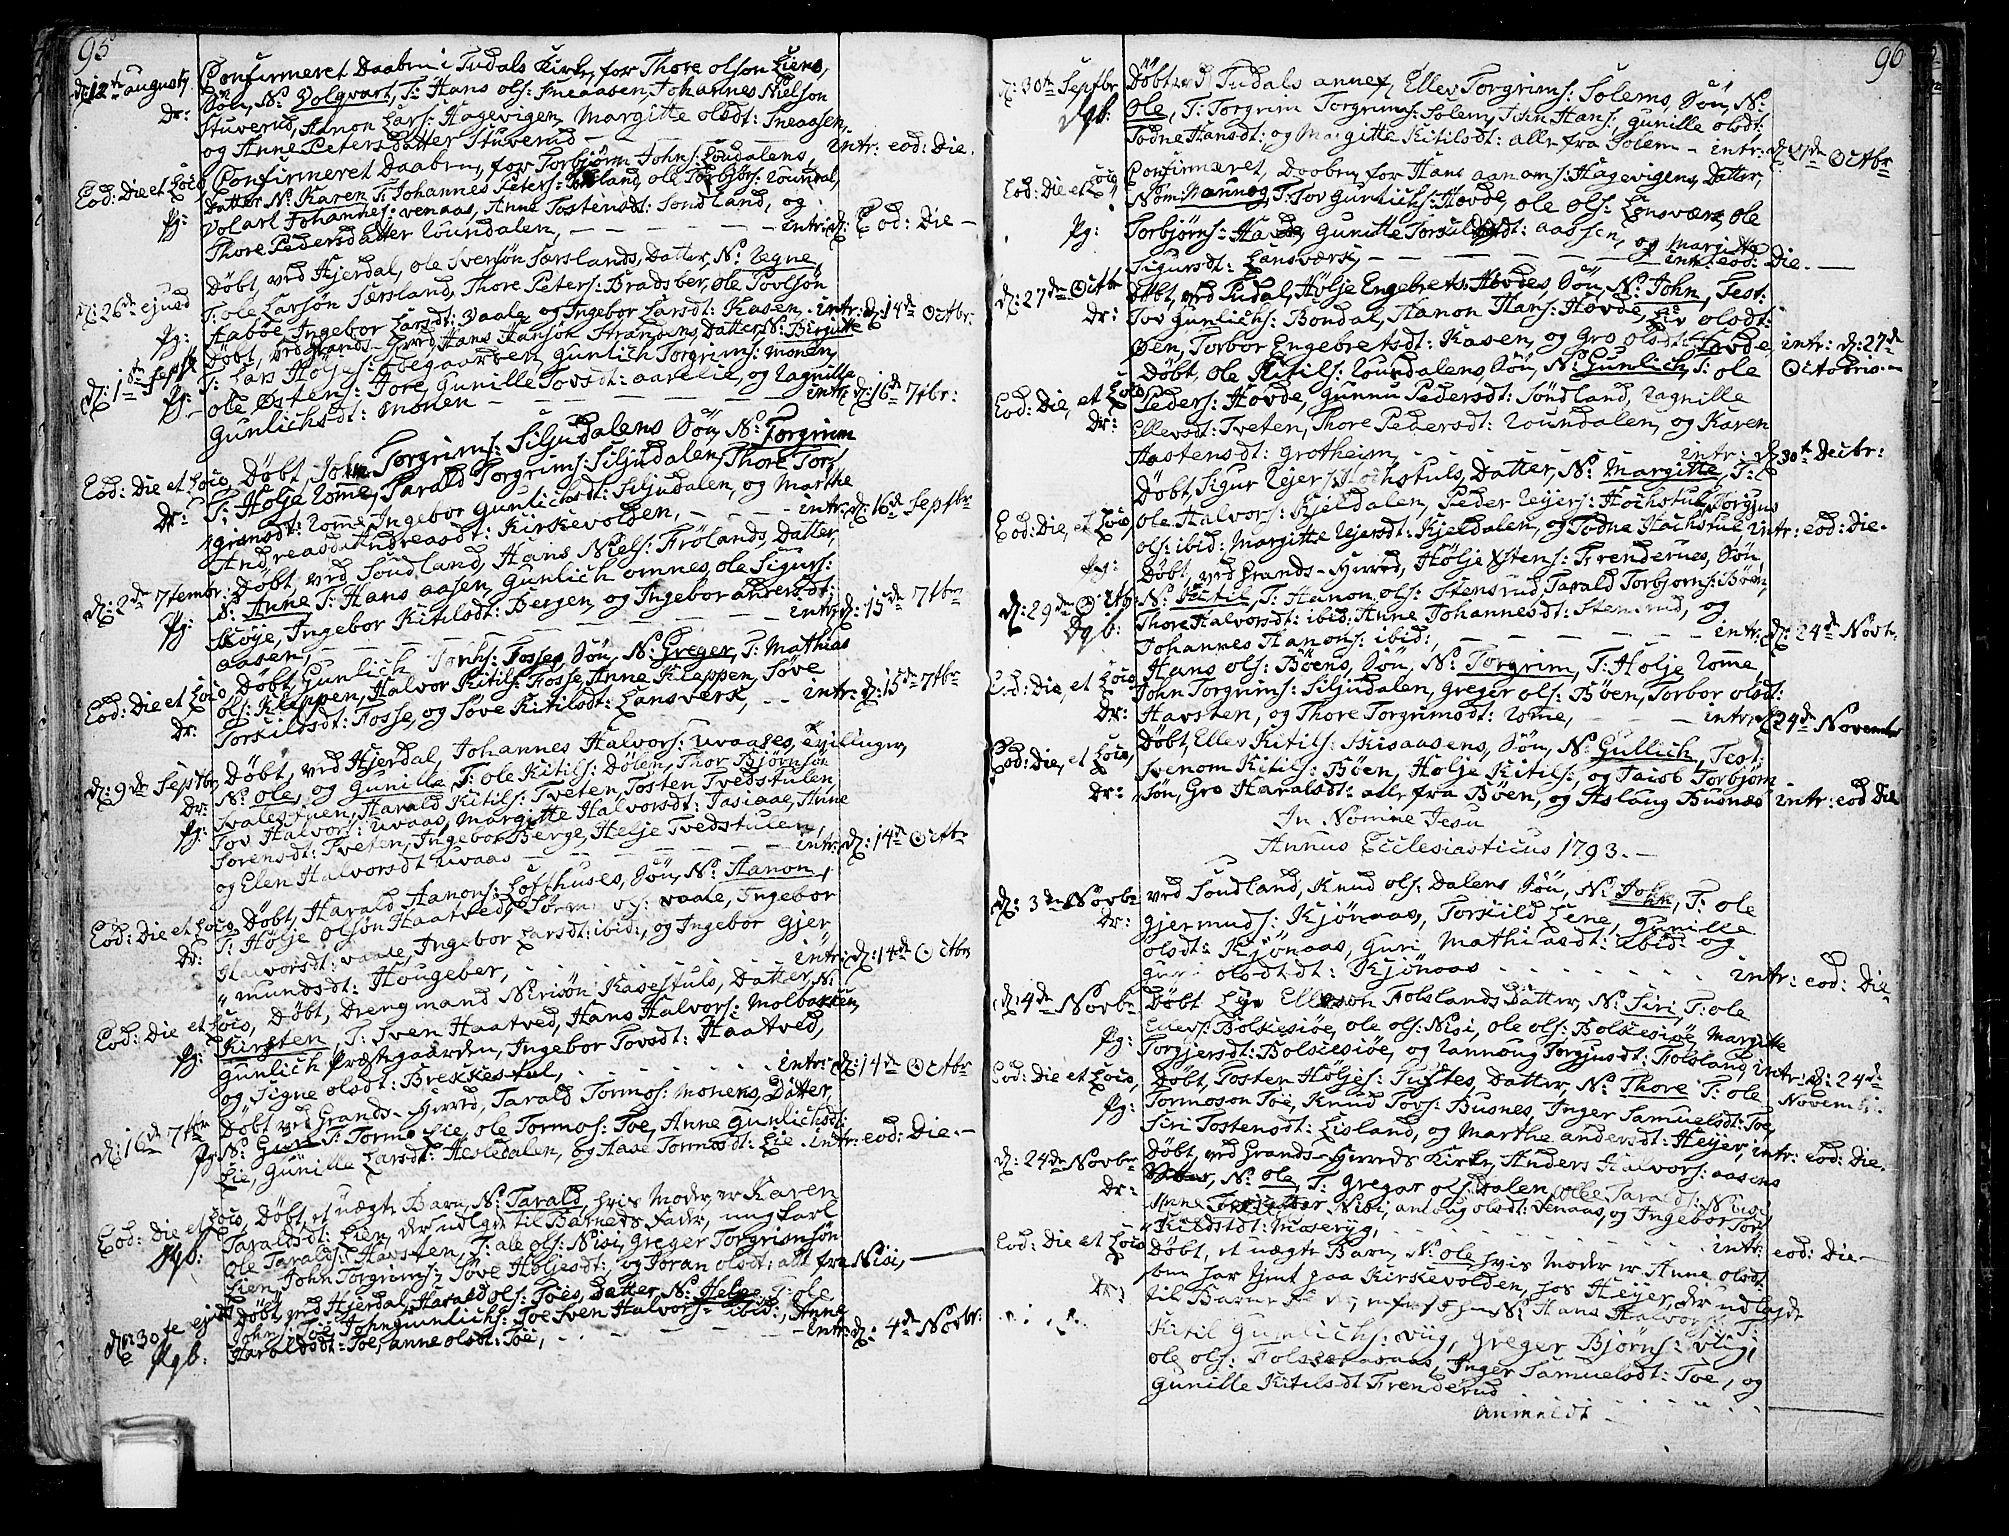 SAKO, Hjartdal kirkebøker, F/Fa/L0005: Ministerialbok nr. I 5, 1776-1801, s. 95-96